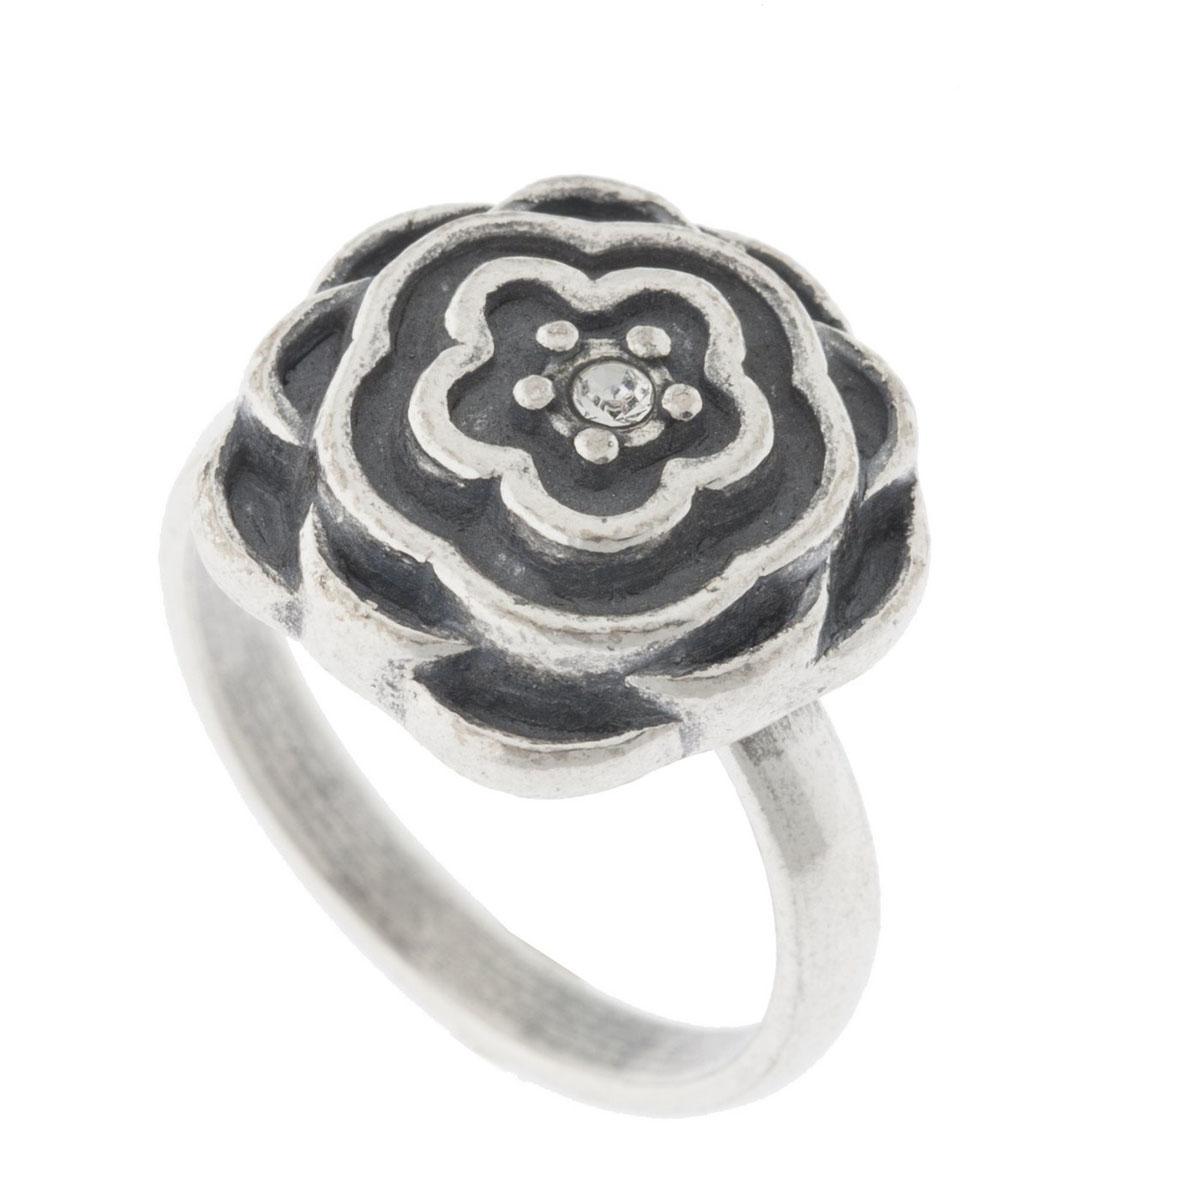 Кольцо Jenavi Рэта, цвет: серебро, белый. k5273000. Размер 17k5273000Коллекция Jetta, Рэта (Кольцо) гипоаллергенный ювелирный сплав,Черненое серебро, вставка Кристаллы Swarovski